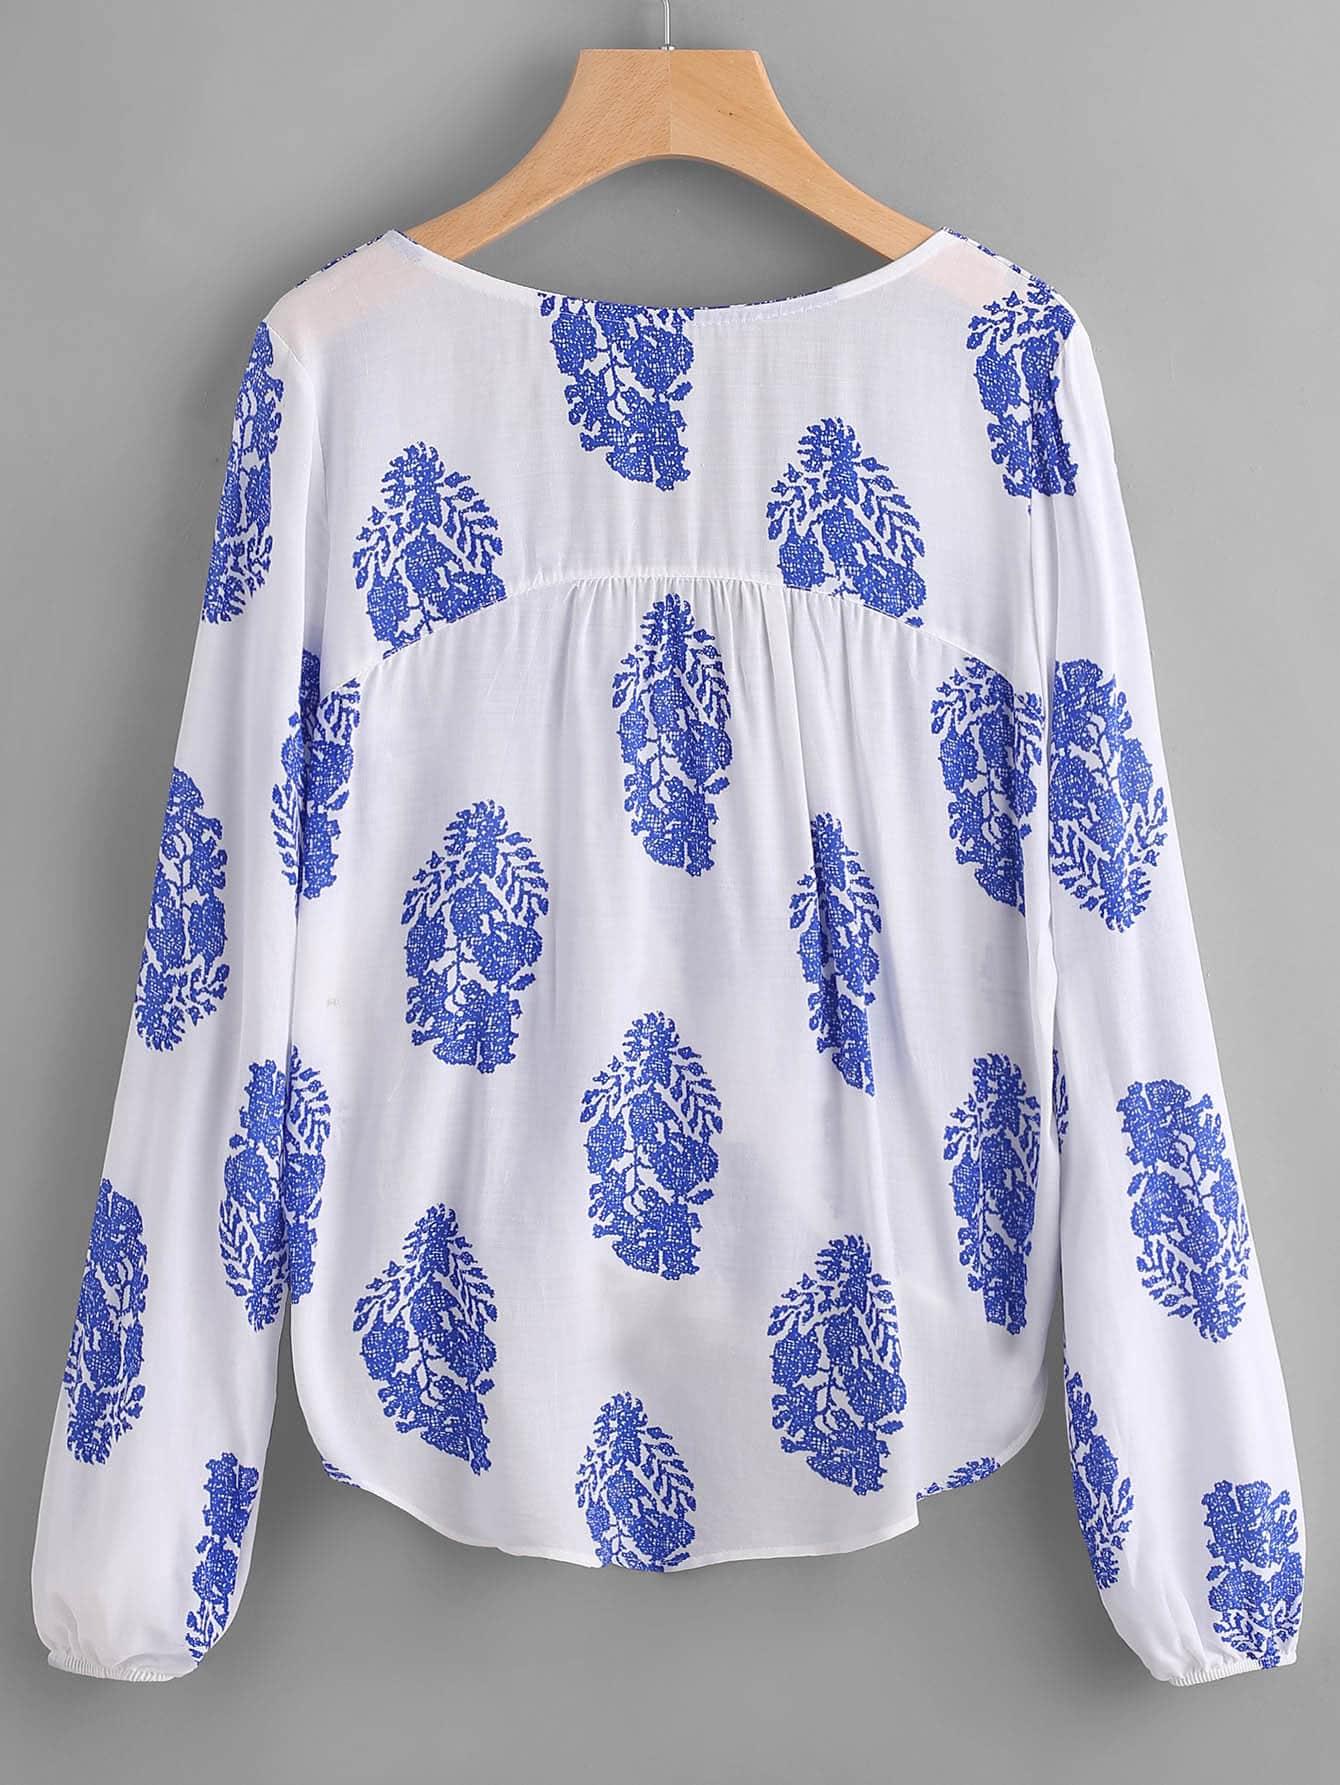 blouse170406005_2